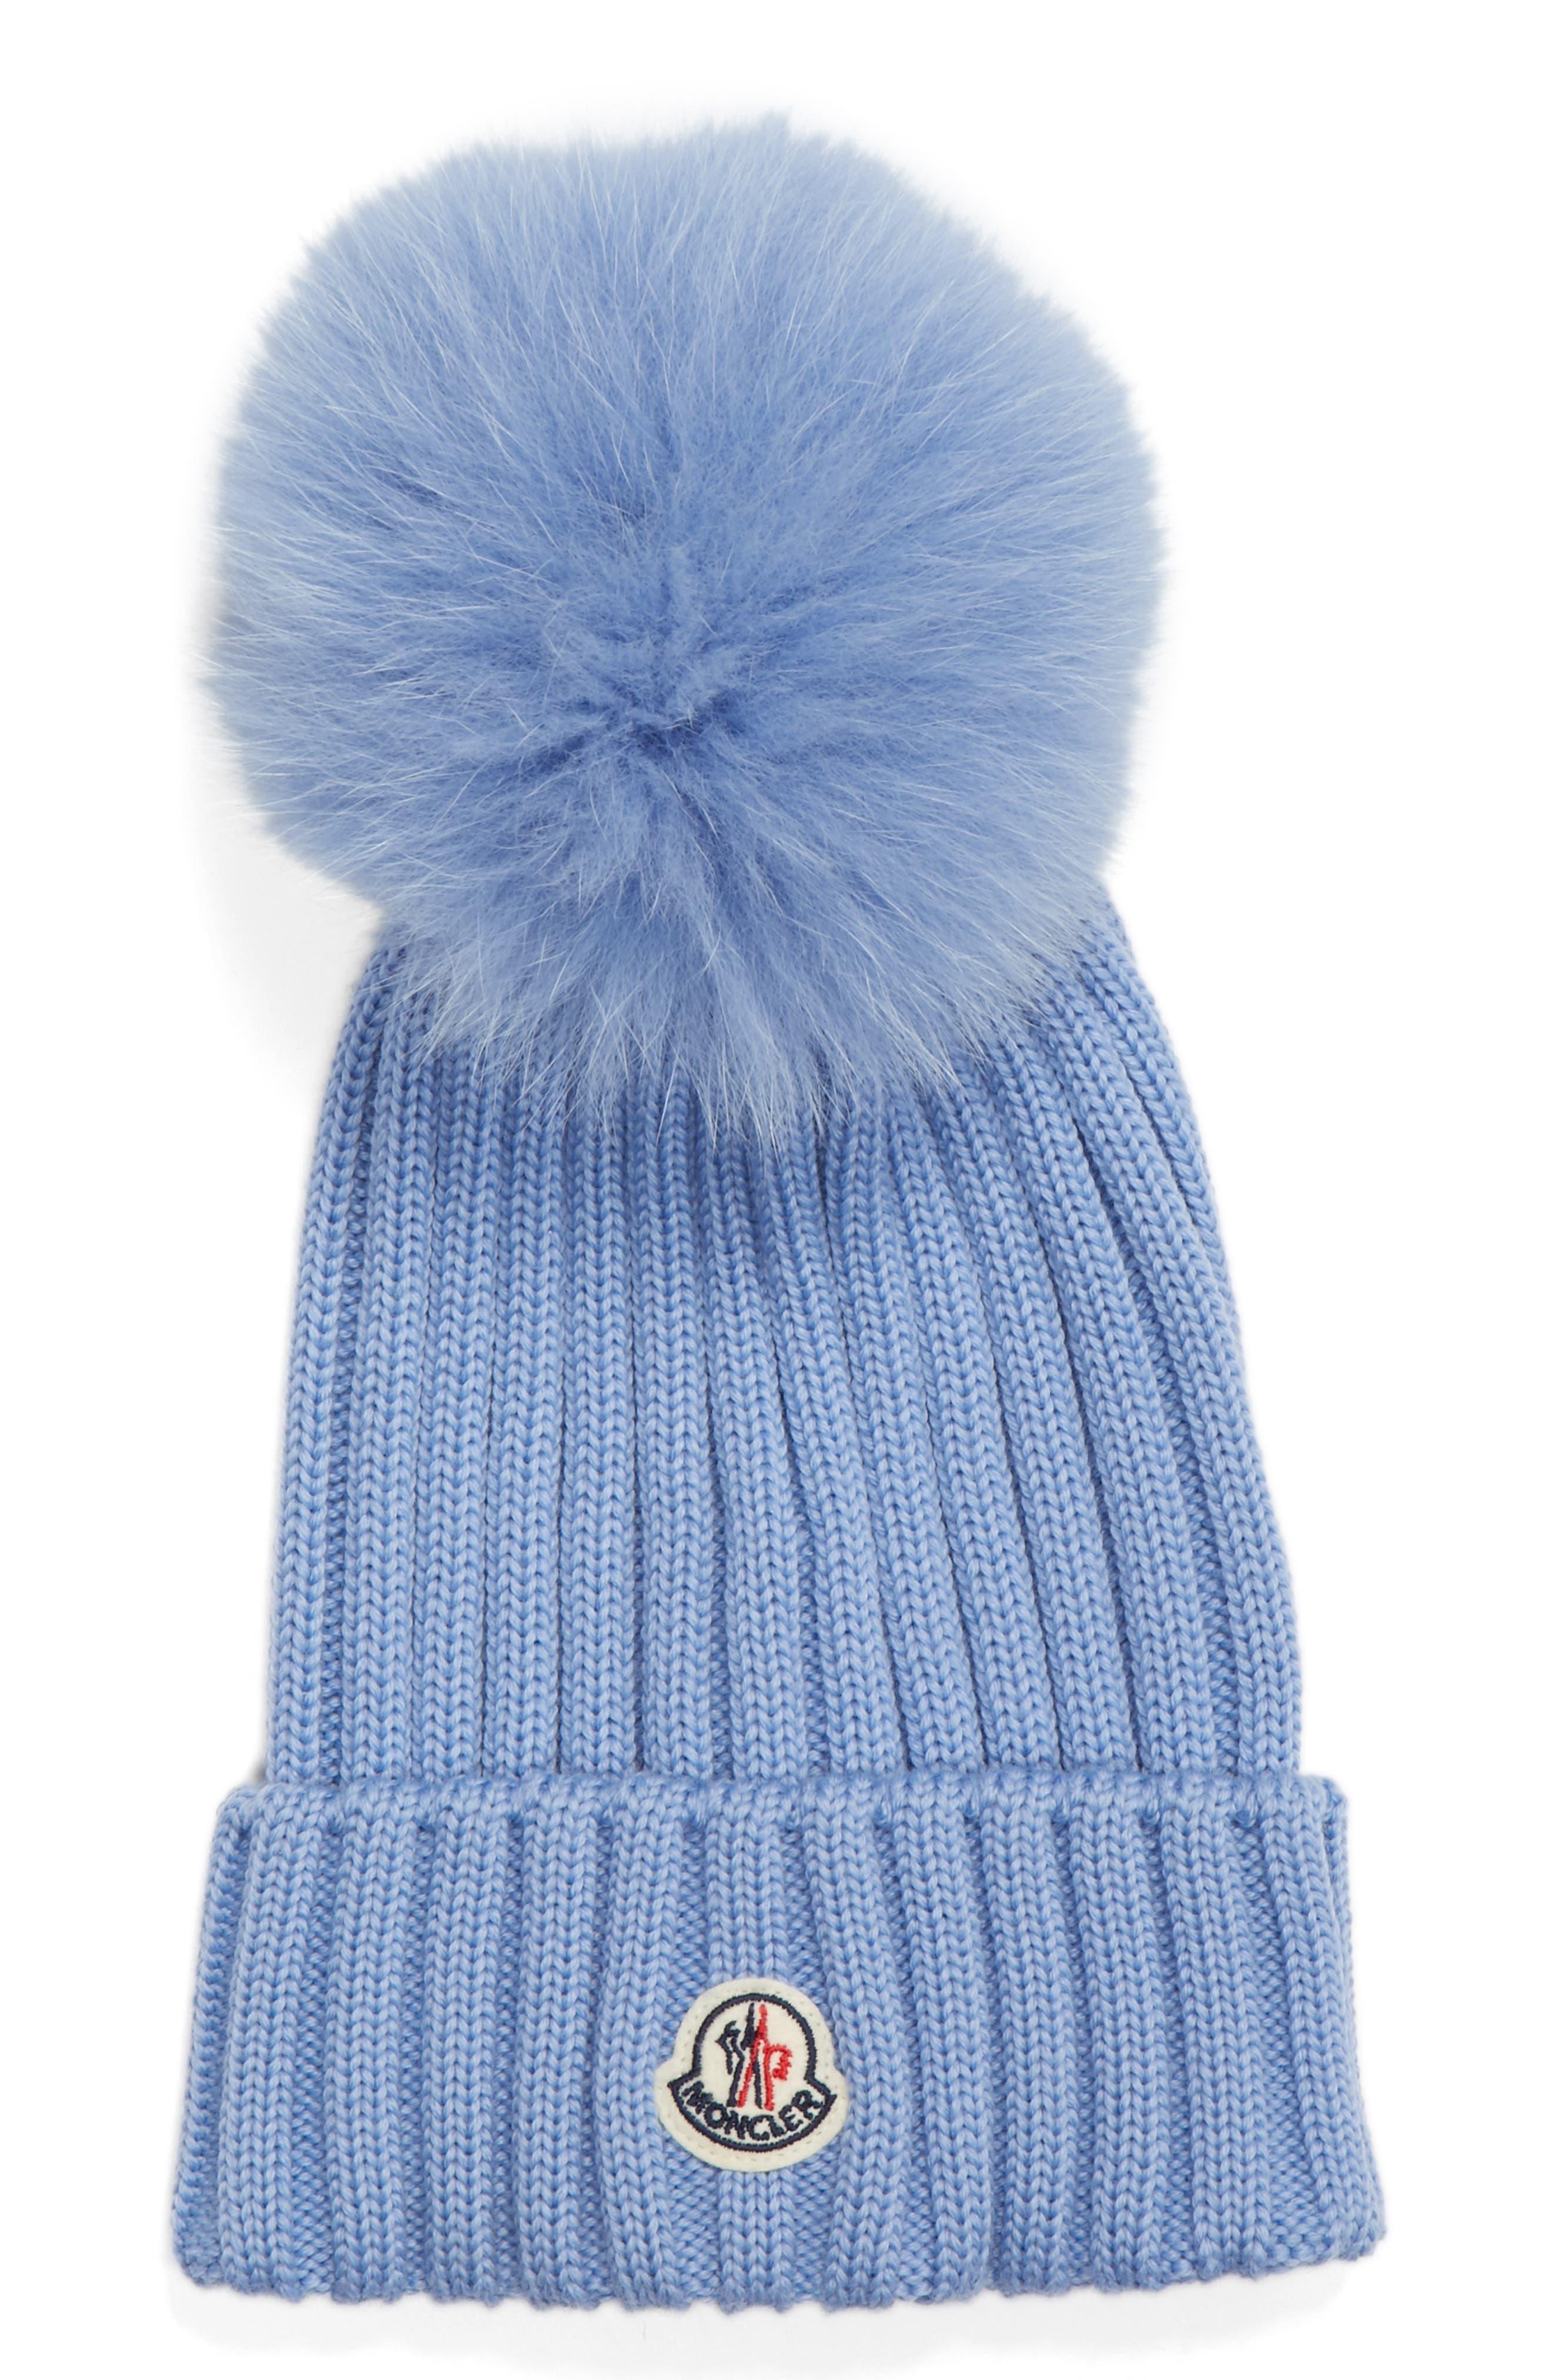 Main Image - Moncler Genuine Fox Fur Pom Wool Beanie